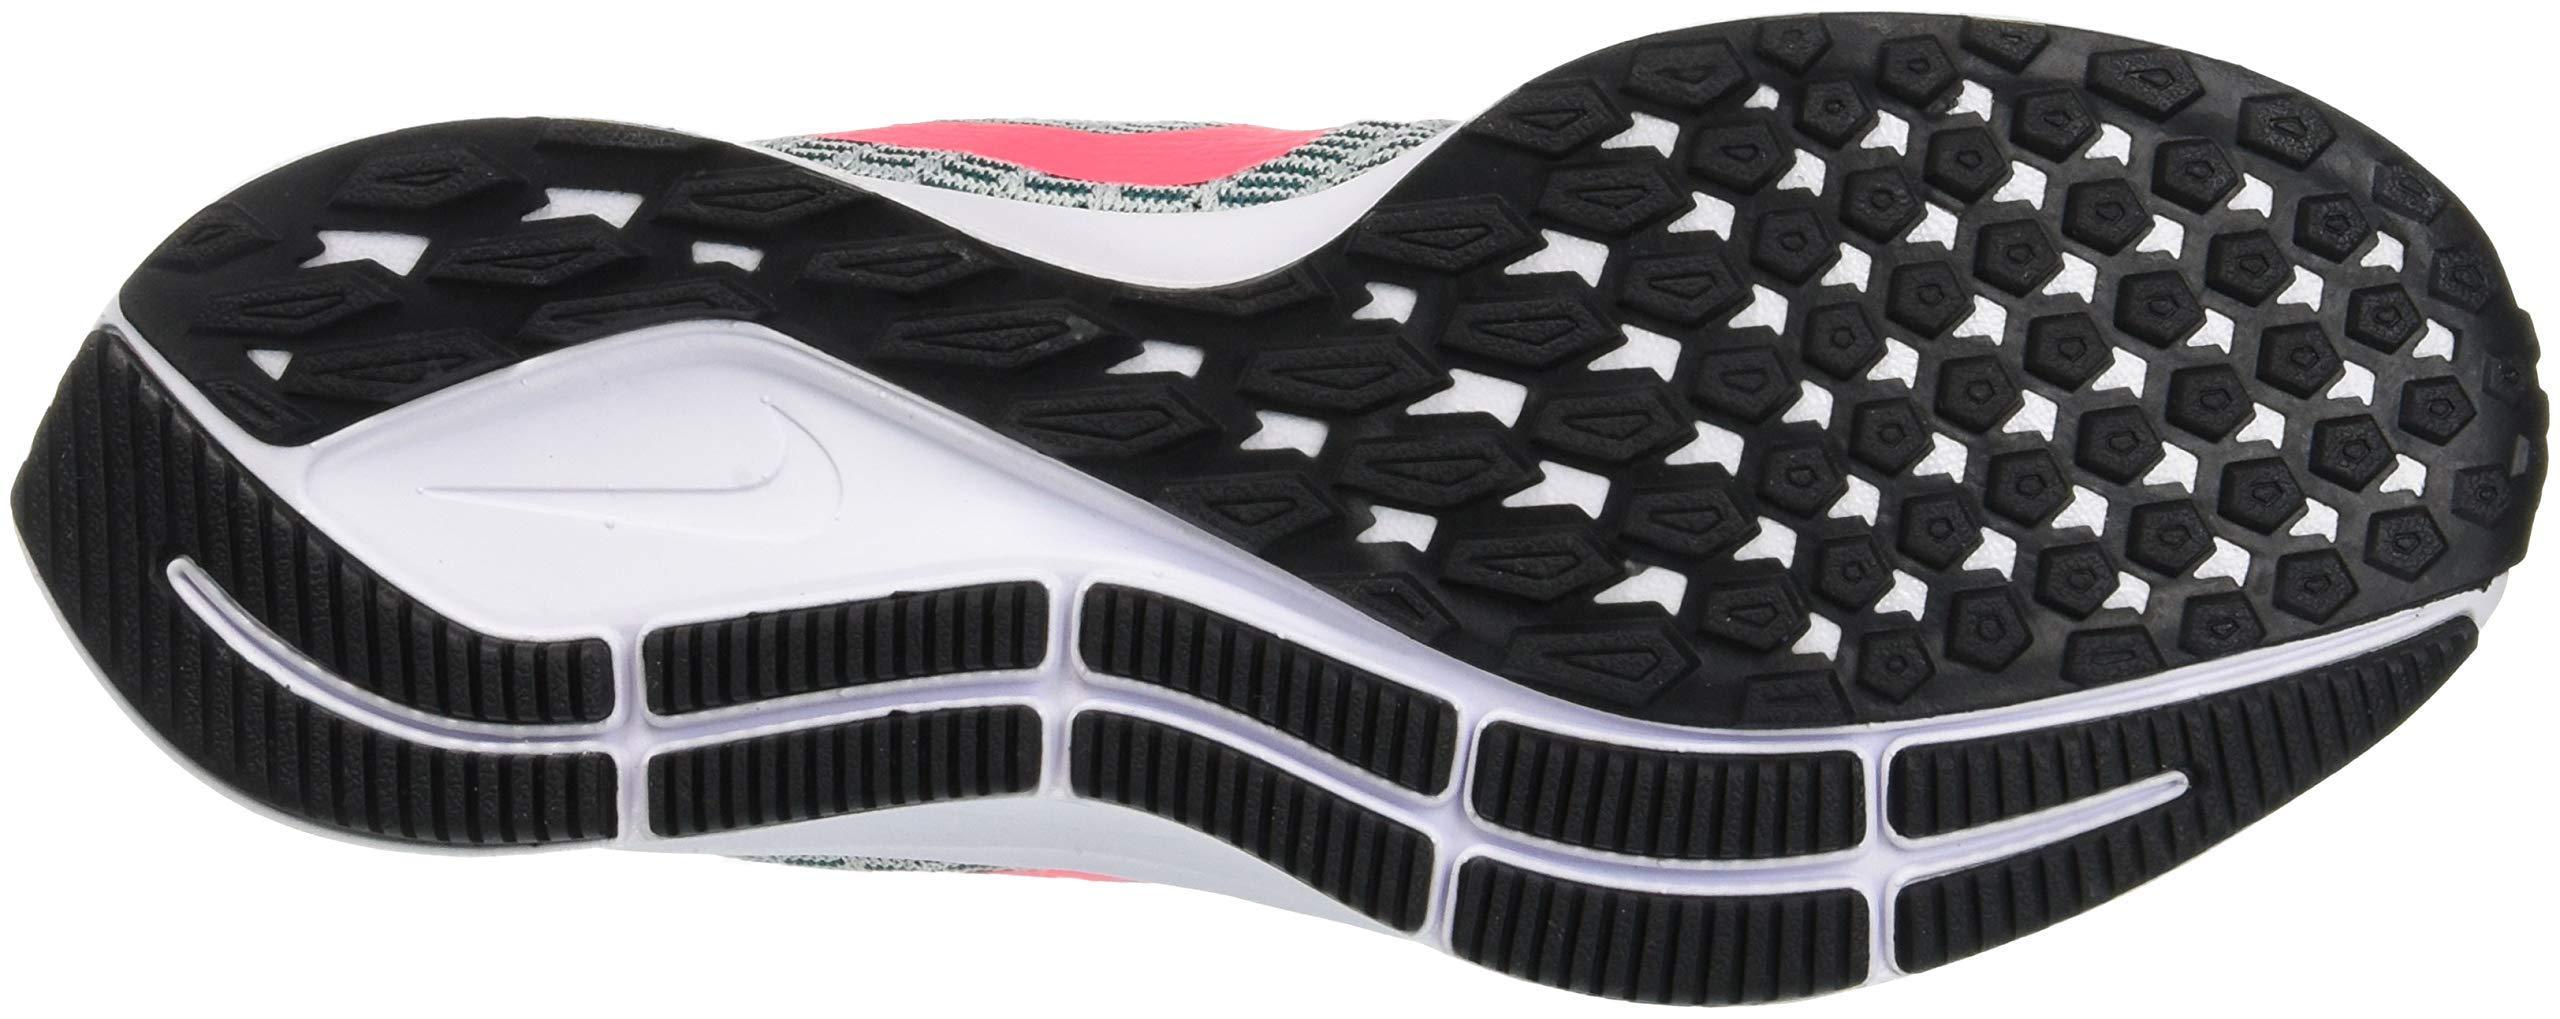 Nike Air Zoom Pegasus 35, Women's Running, Multicolored (Barely Grey/Hot Punch/Geode Teal/Black 009), 4 UK (EU) by Nike (Image #5)